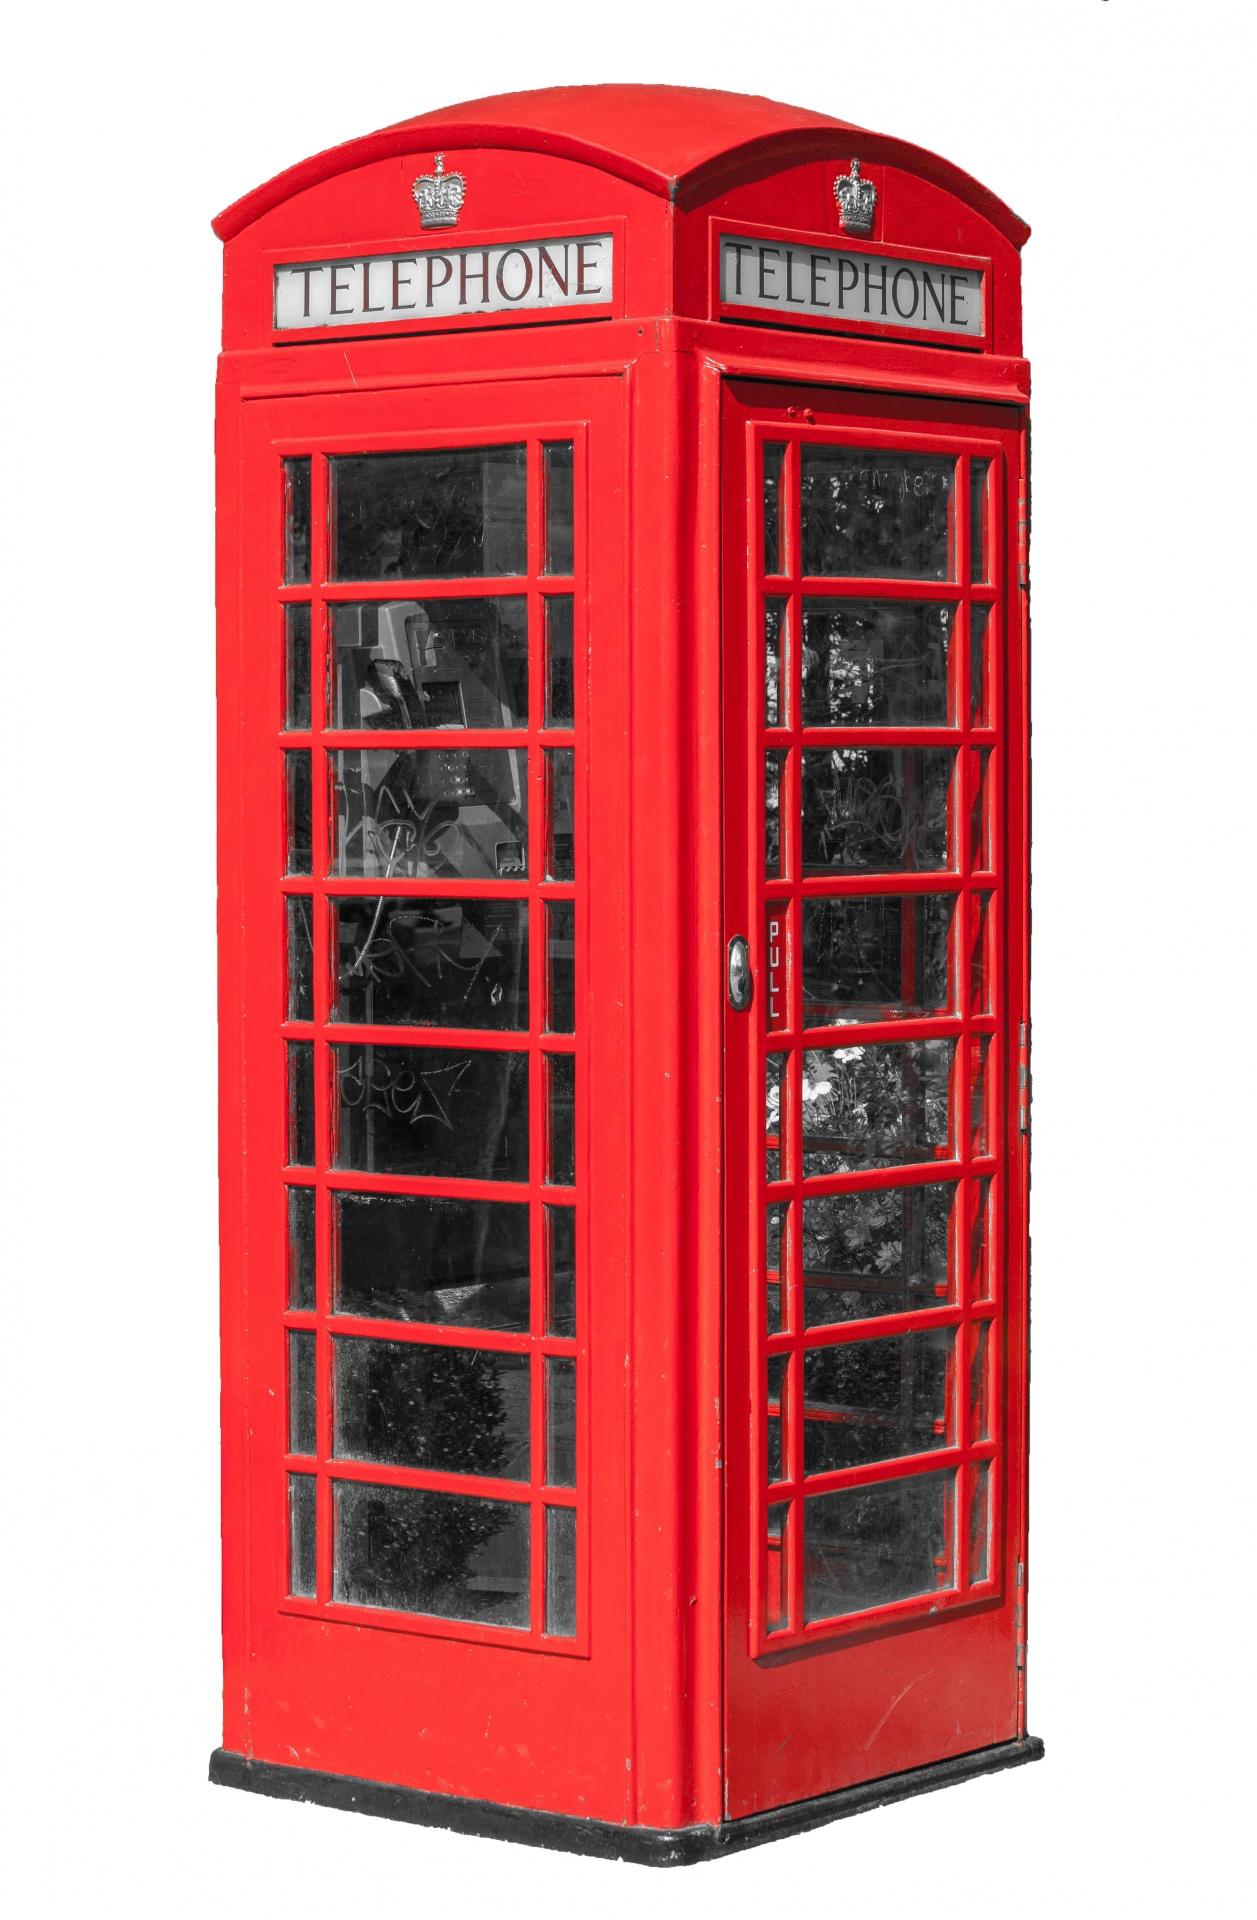 Telephone Box Red Free Stock Photo.